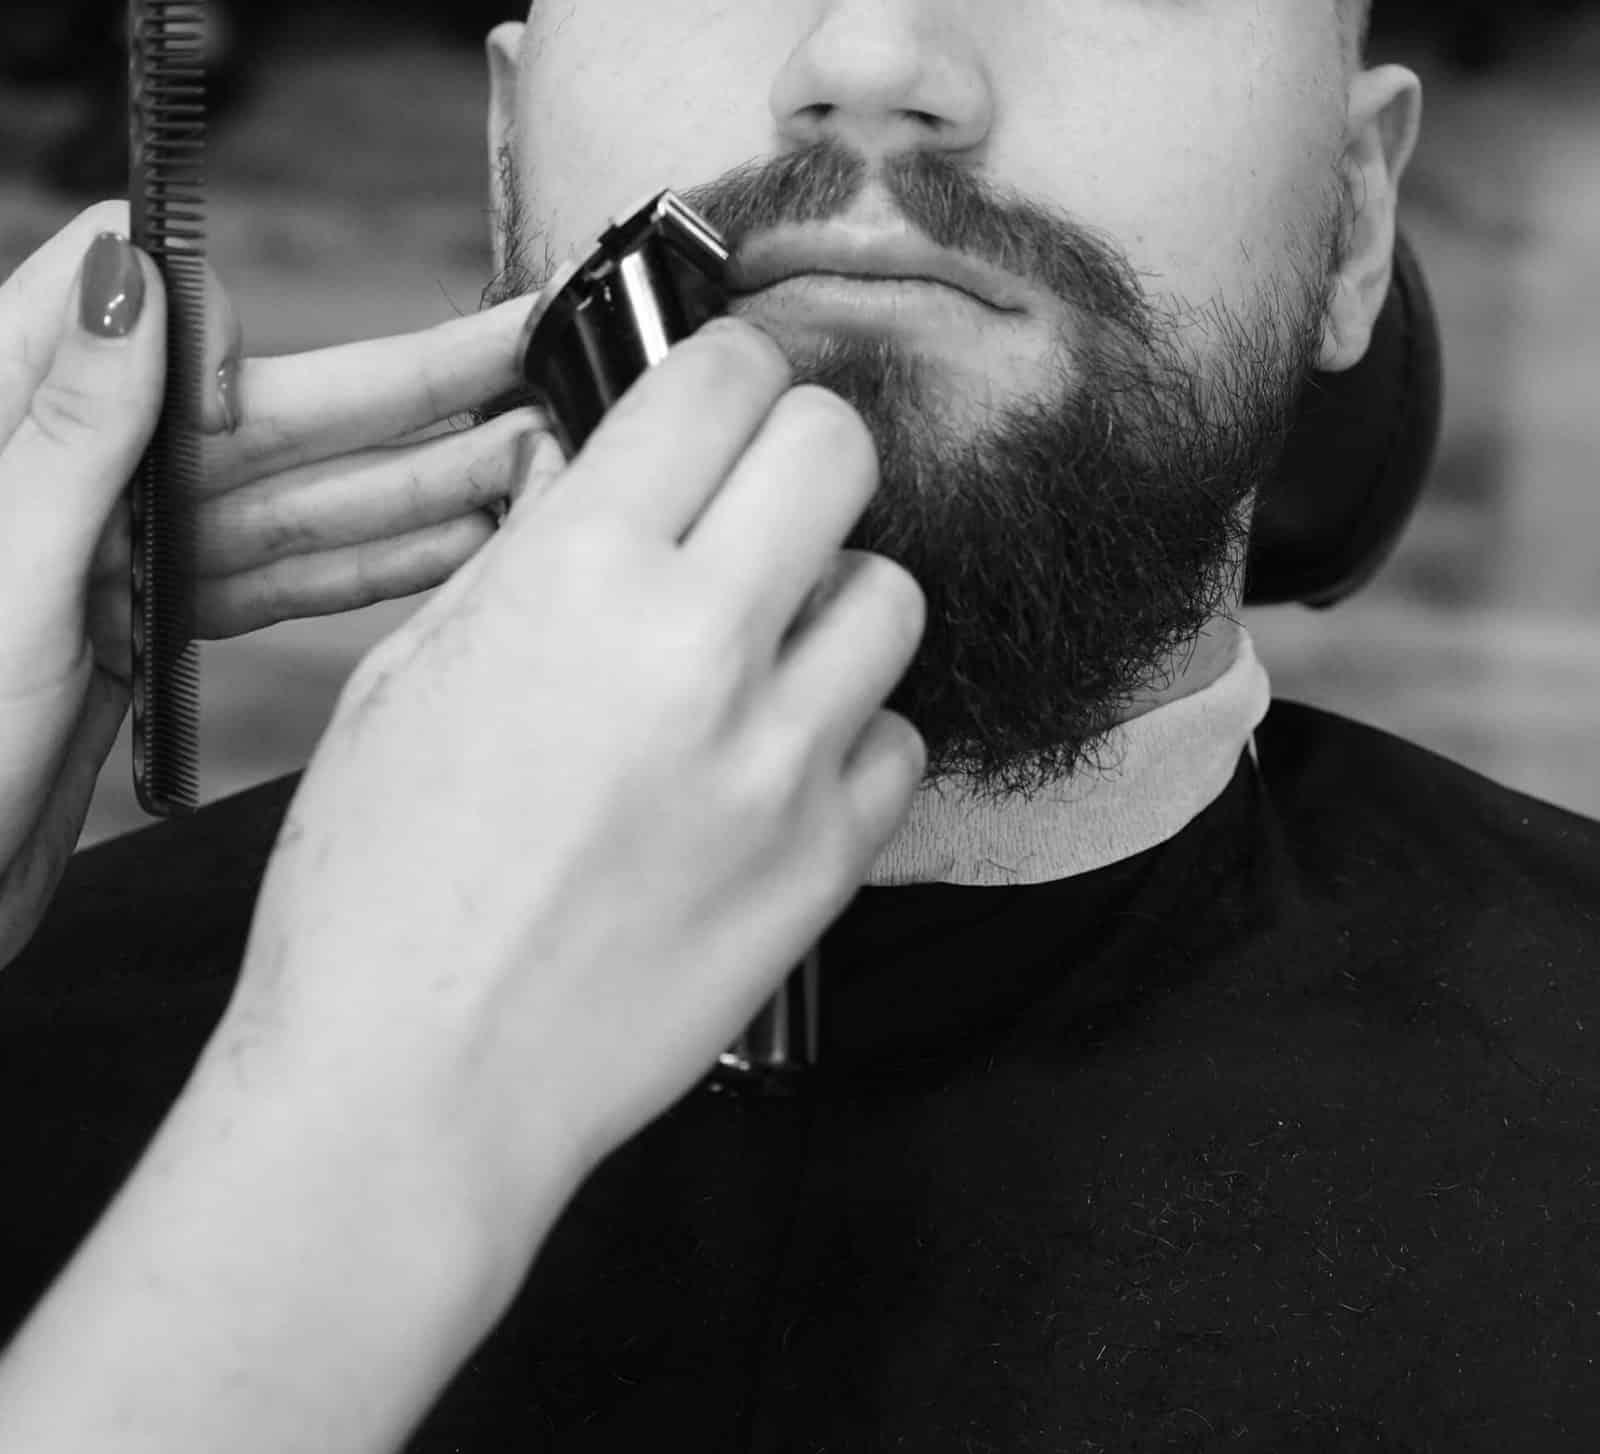 Beauty-тренды: 3 процедуры для мужчин